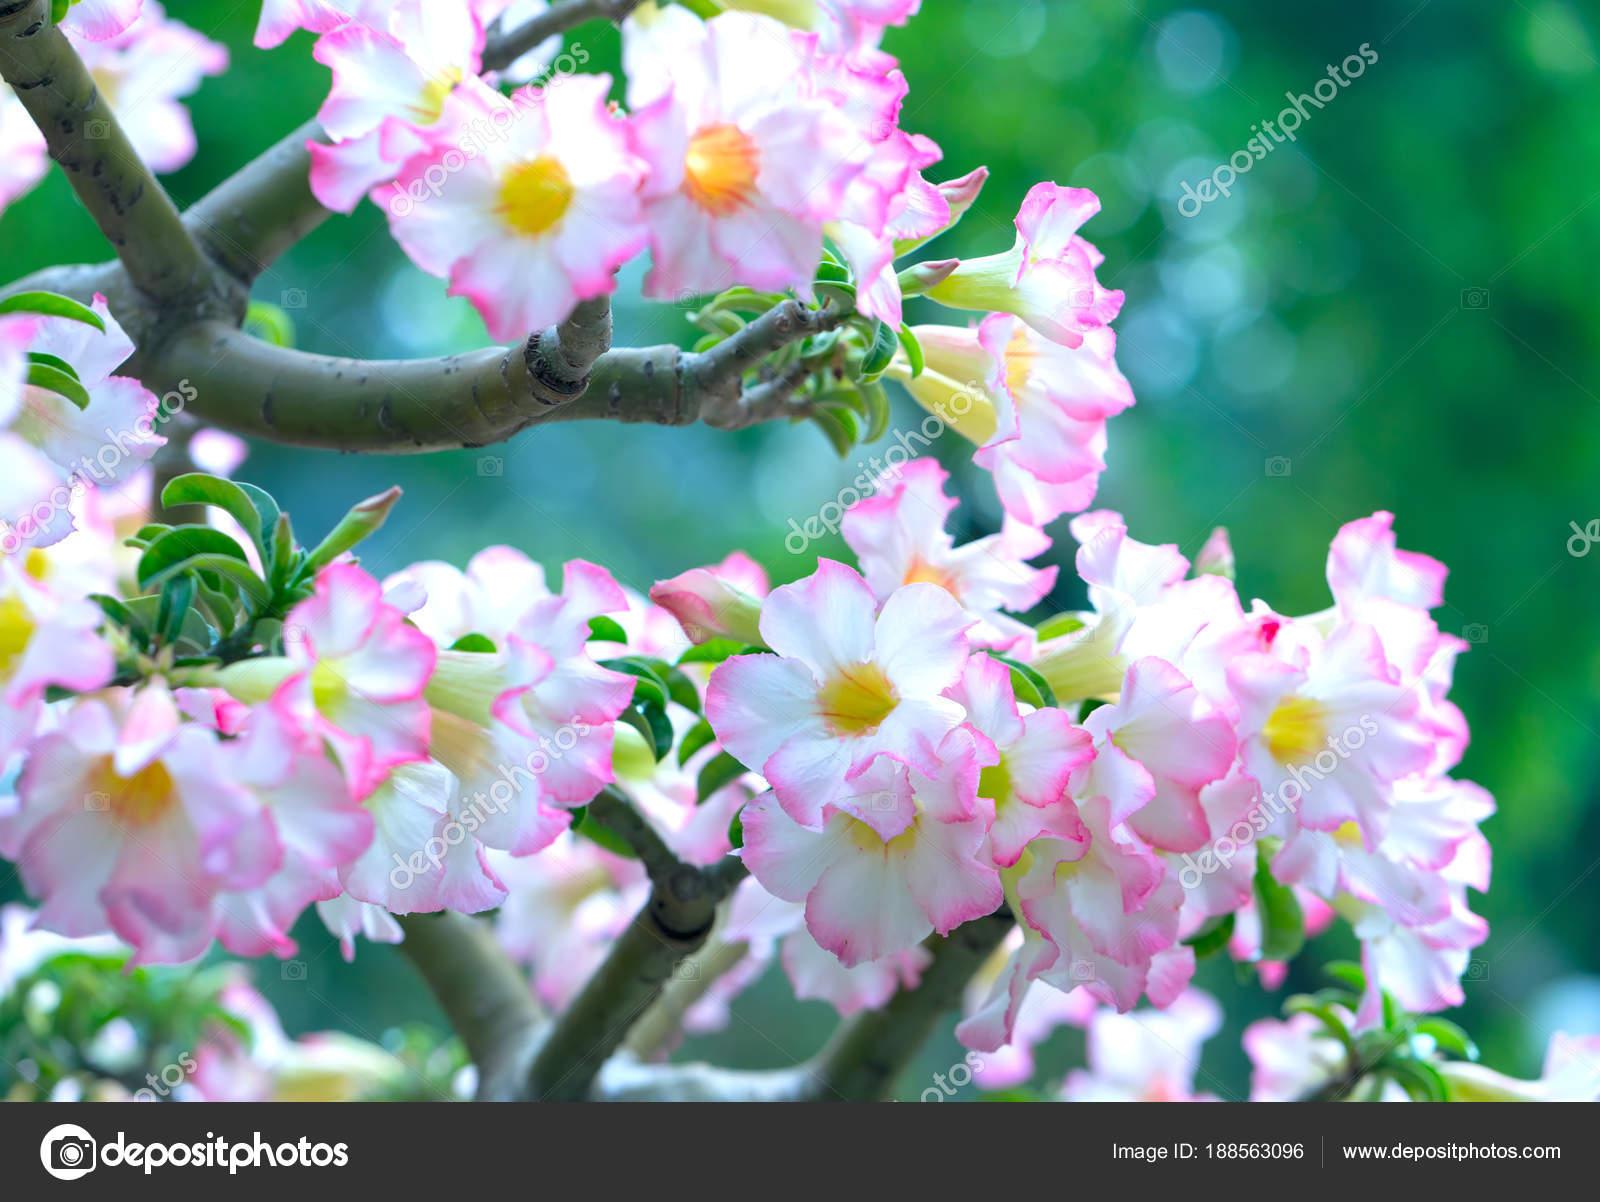 Фото цветов сад аромат